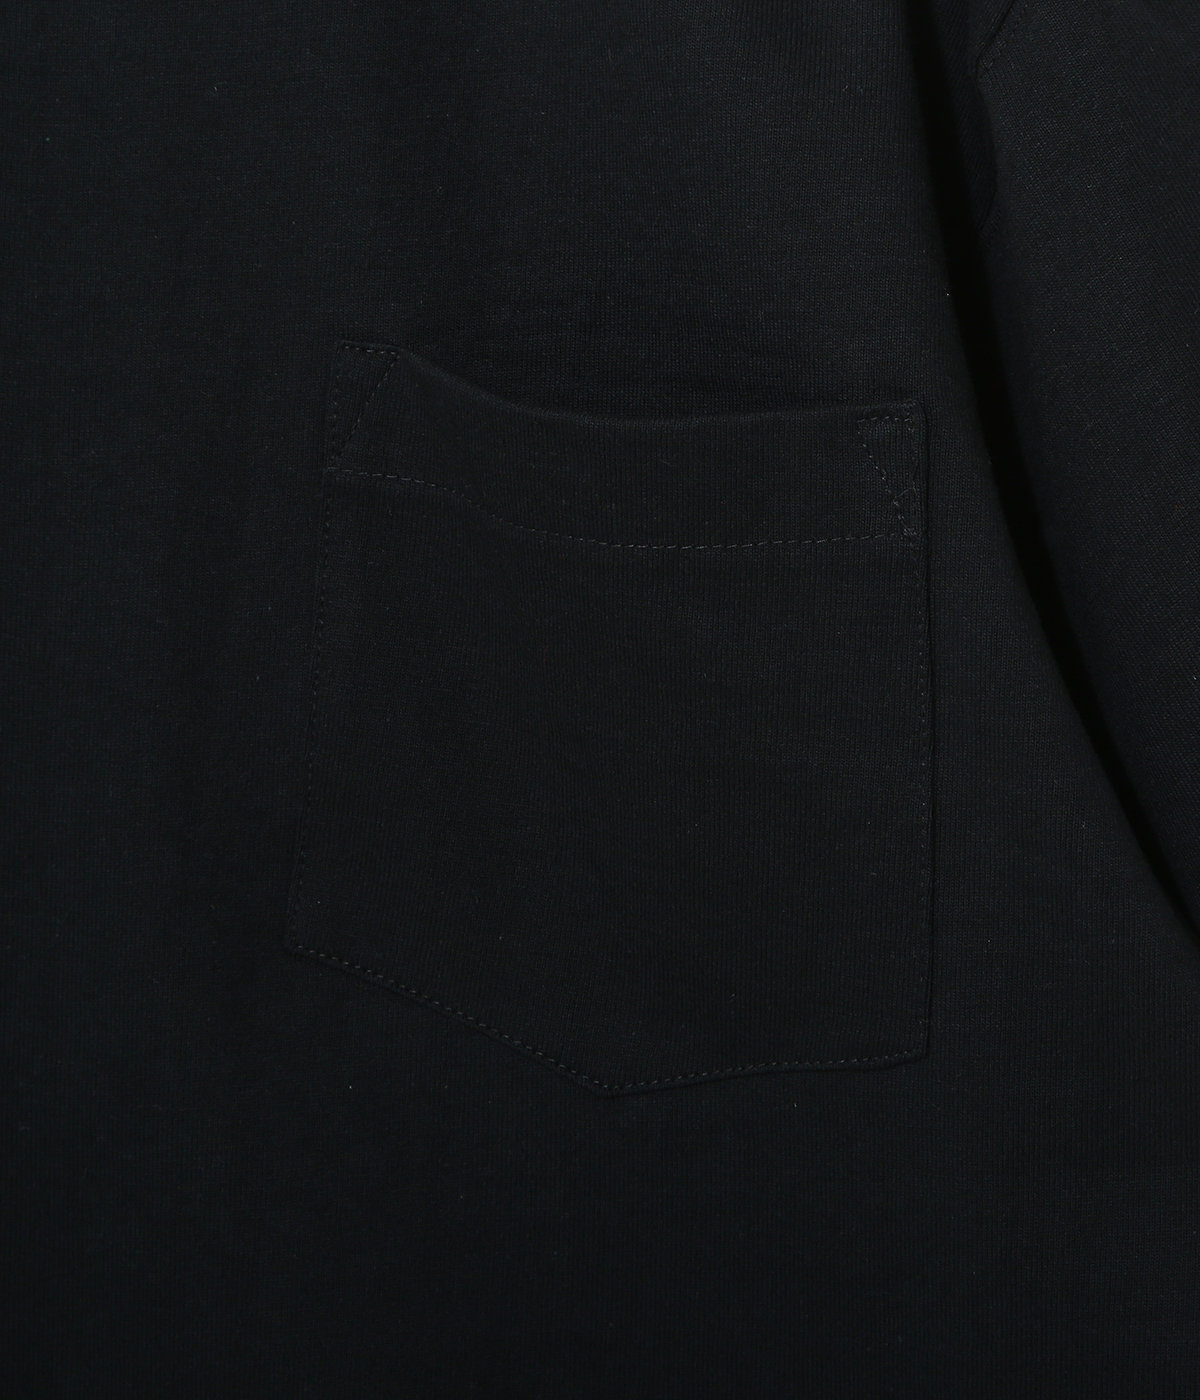 8oz POCKET T-SHIRT (302)